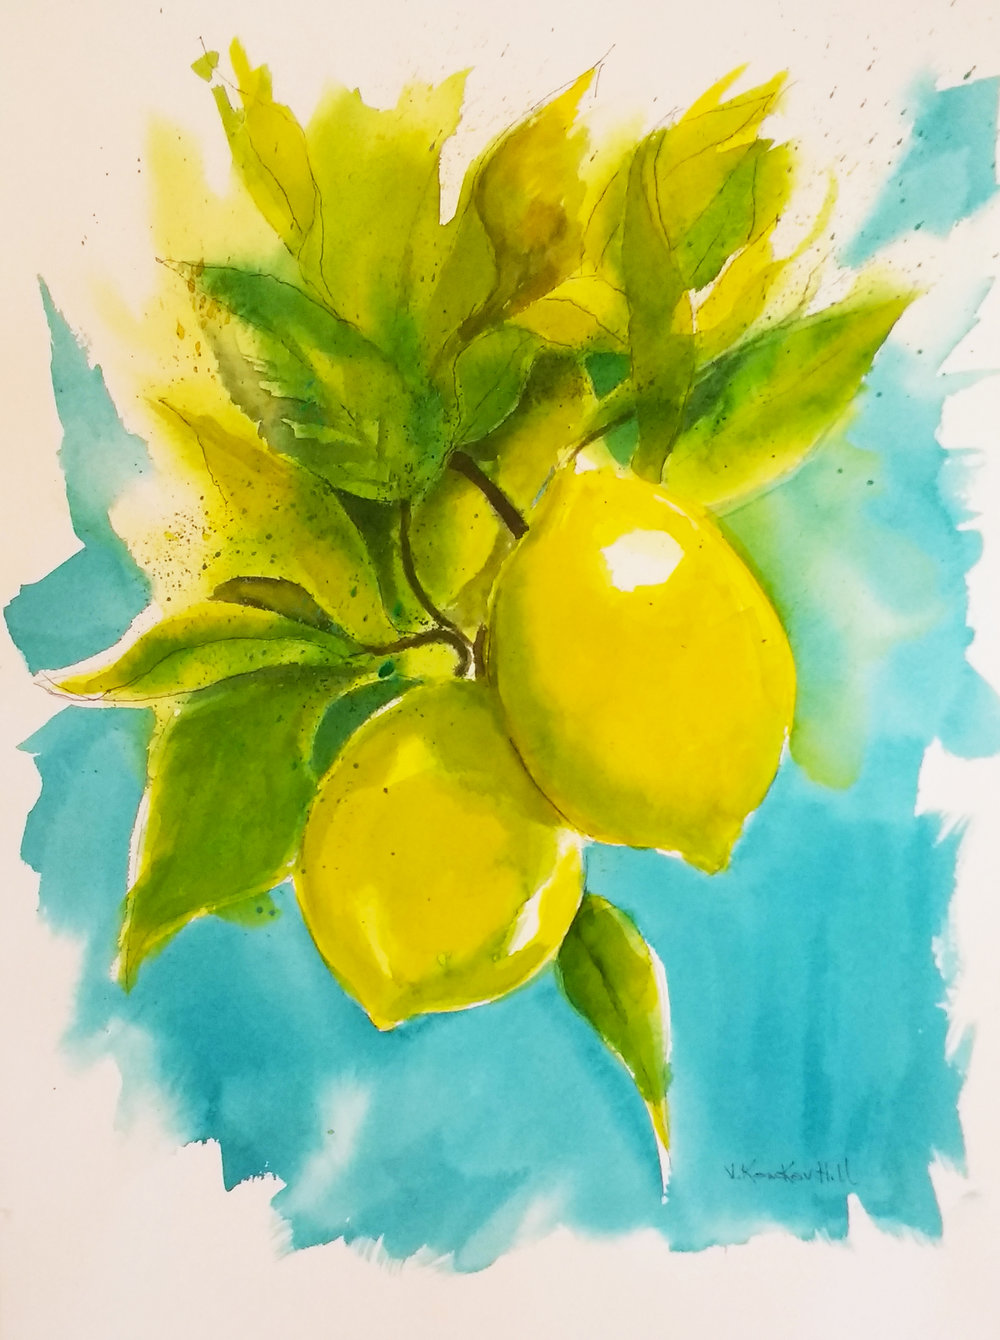 Lemon Tree-Healdsburg, California- 2017